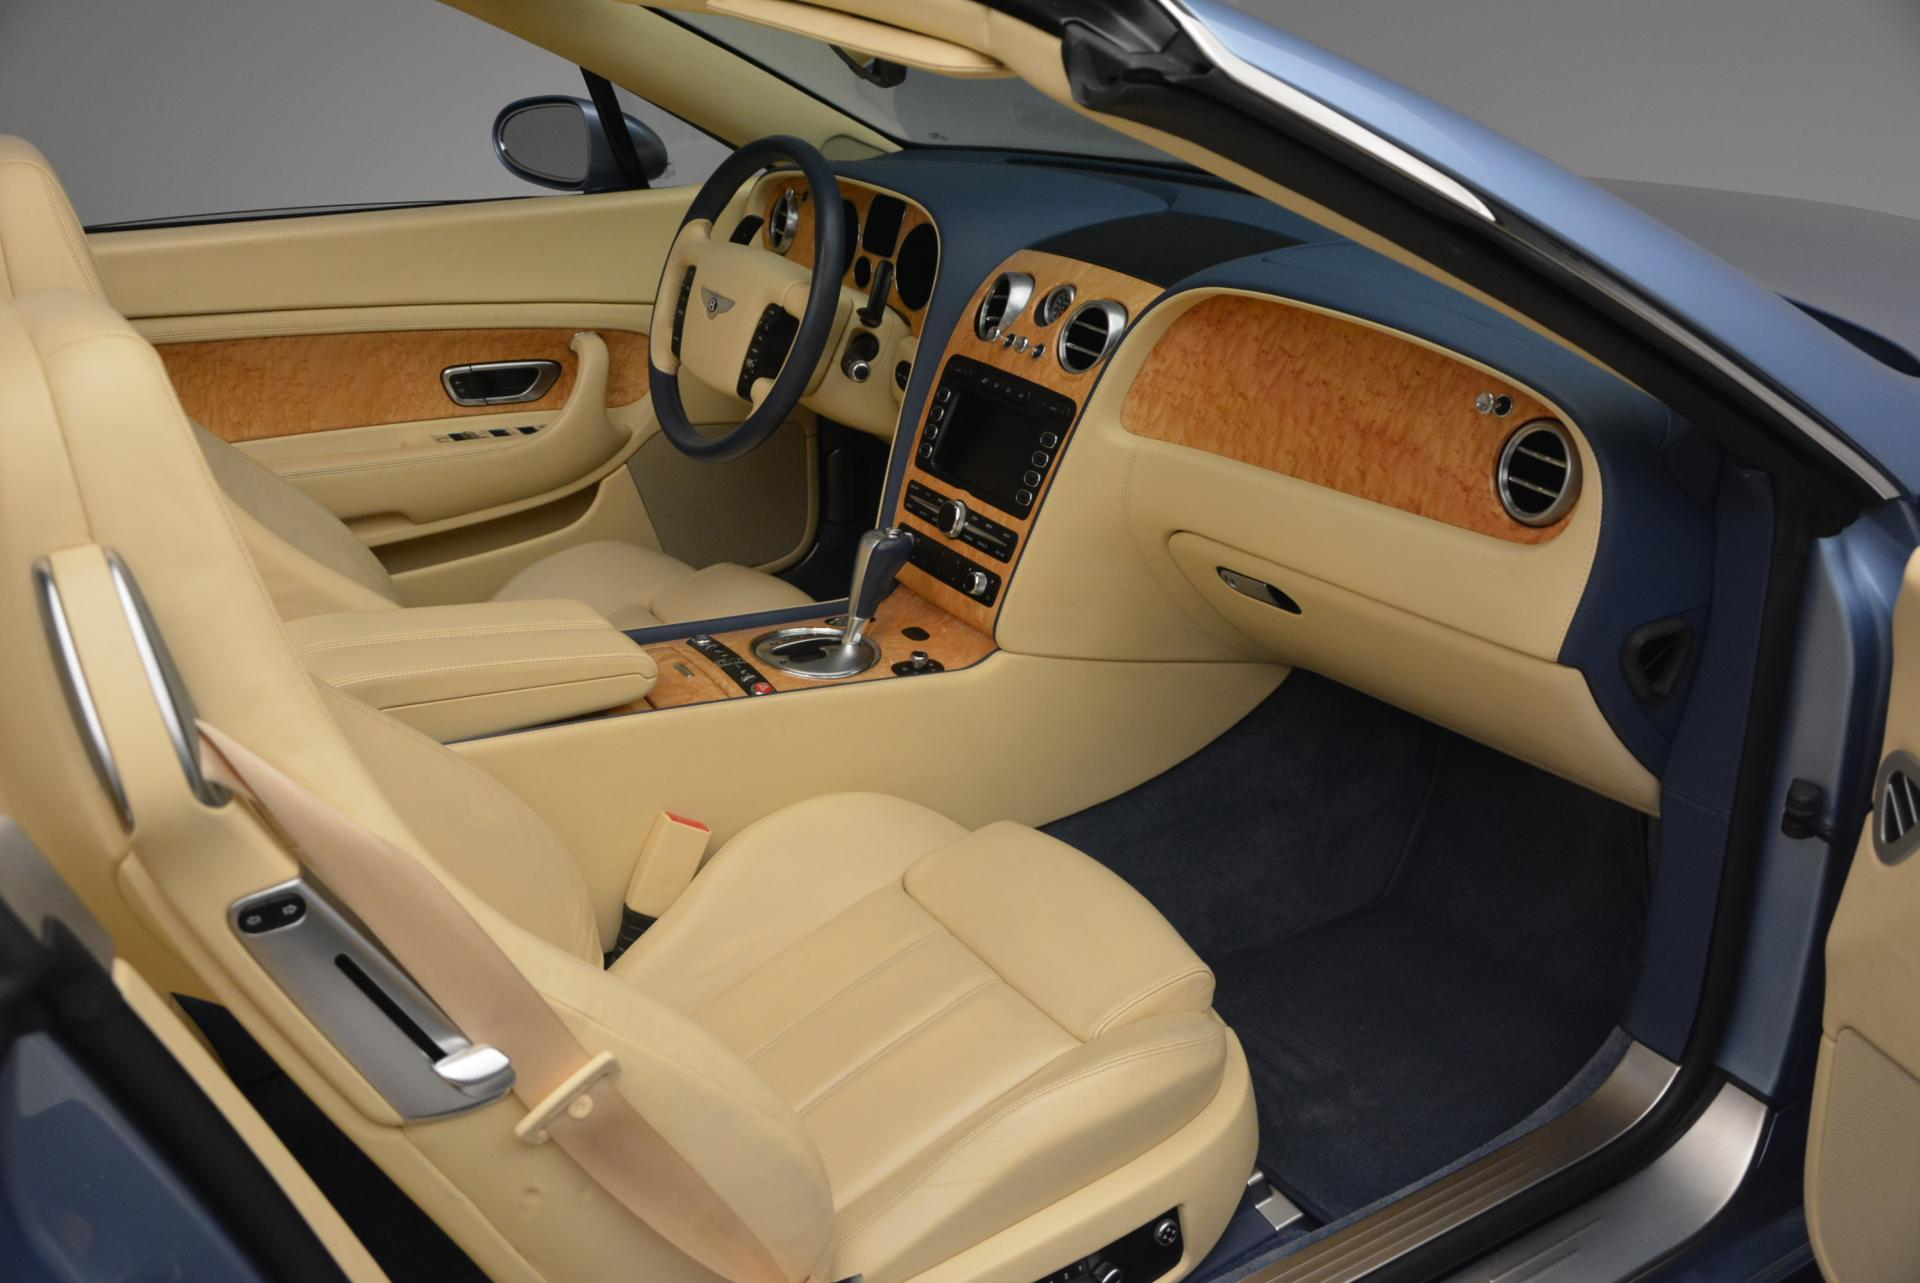 Used 2007 Bentley Continental GTC  For Sale In Westport, CT 495_p46